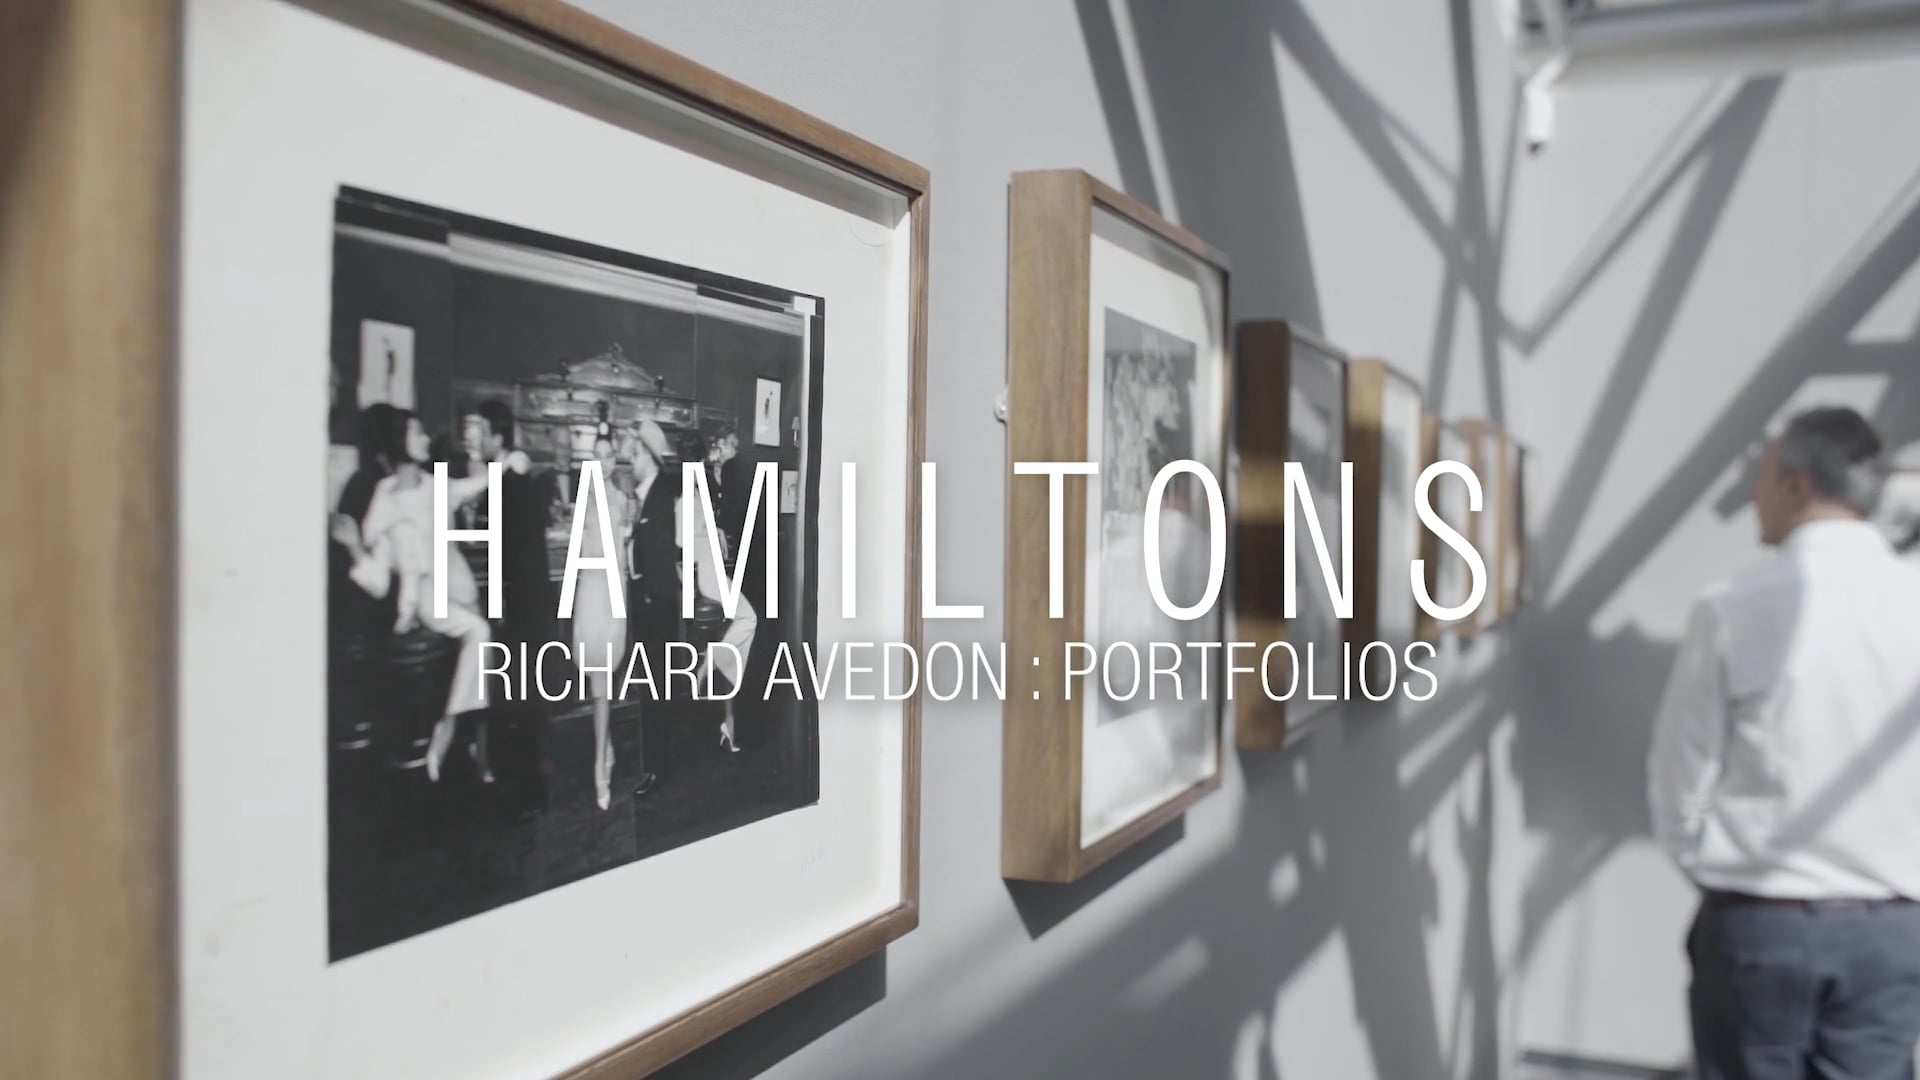 Hamiltons Gallery presents Richard Avedon: Portfolios